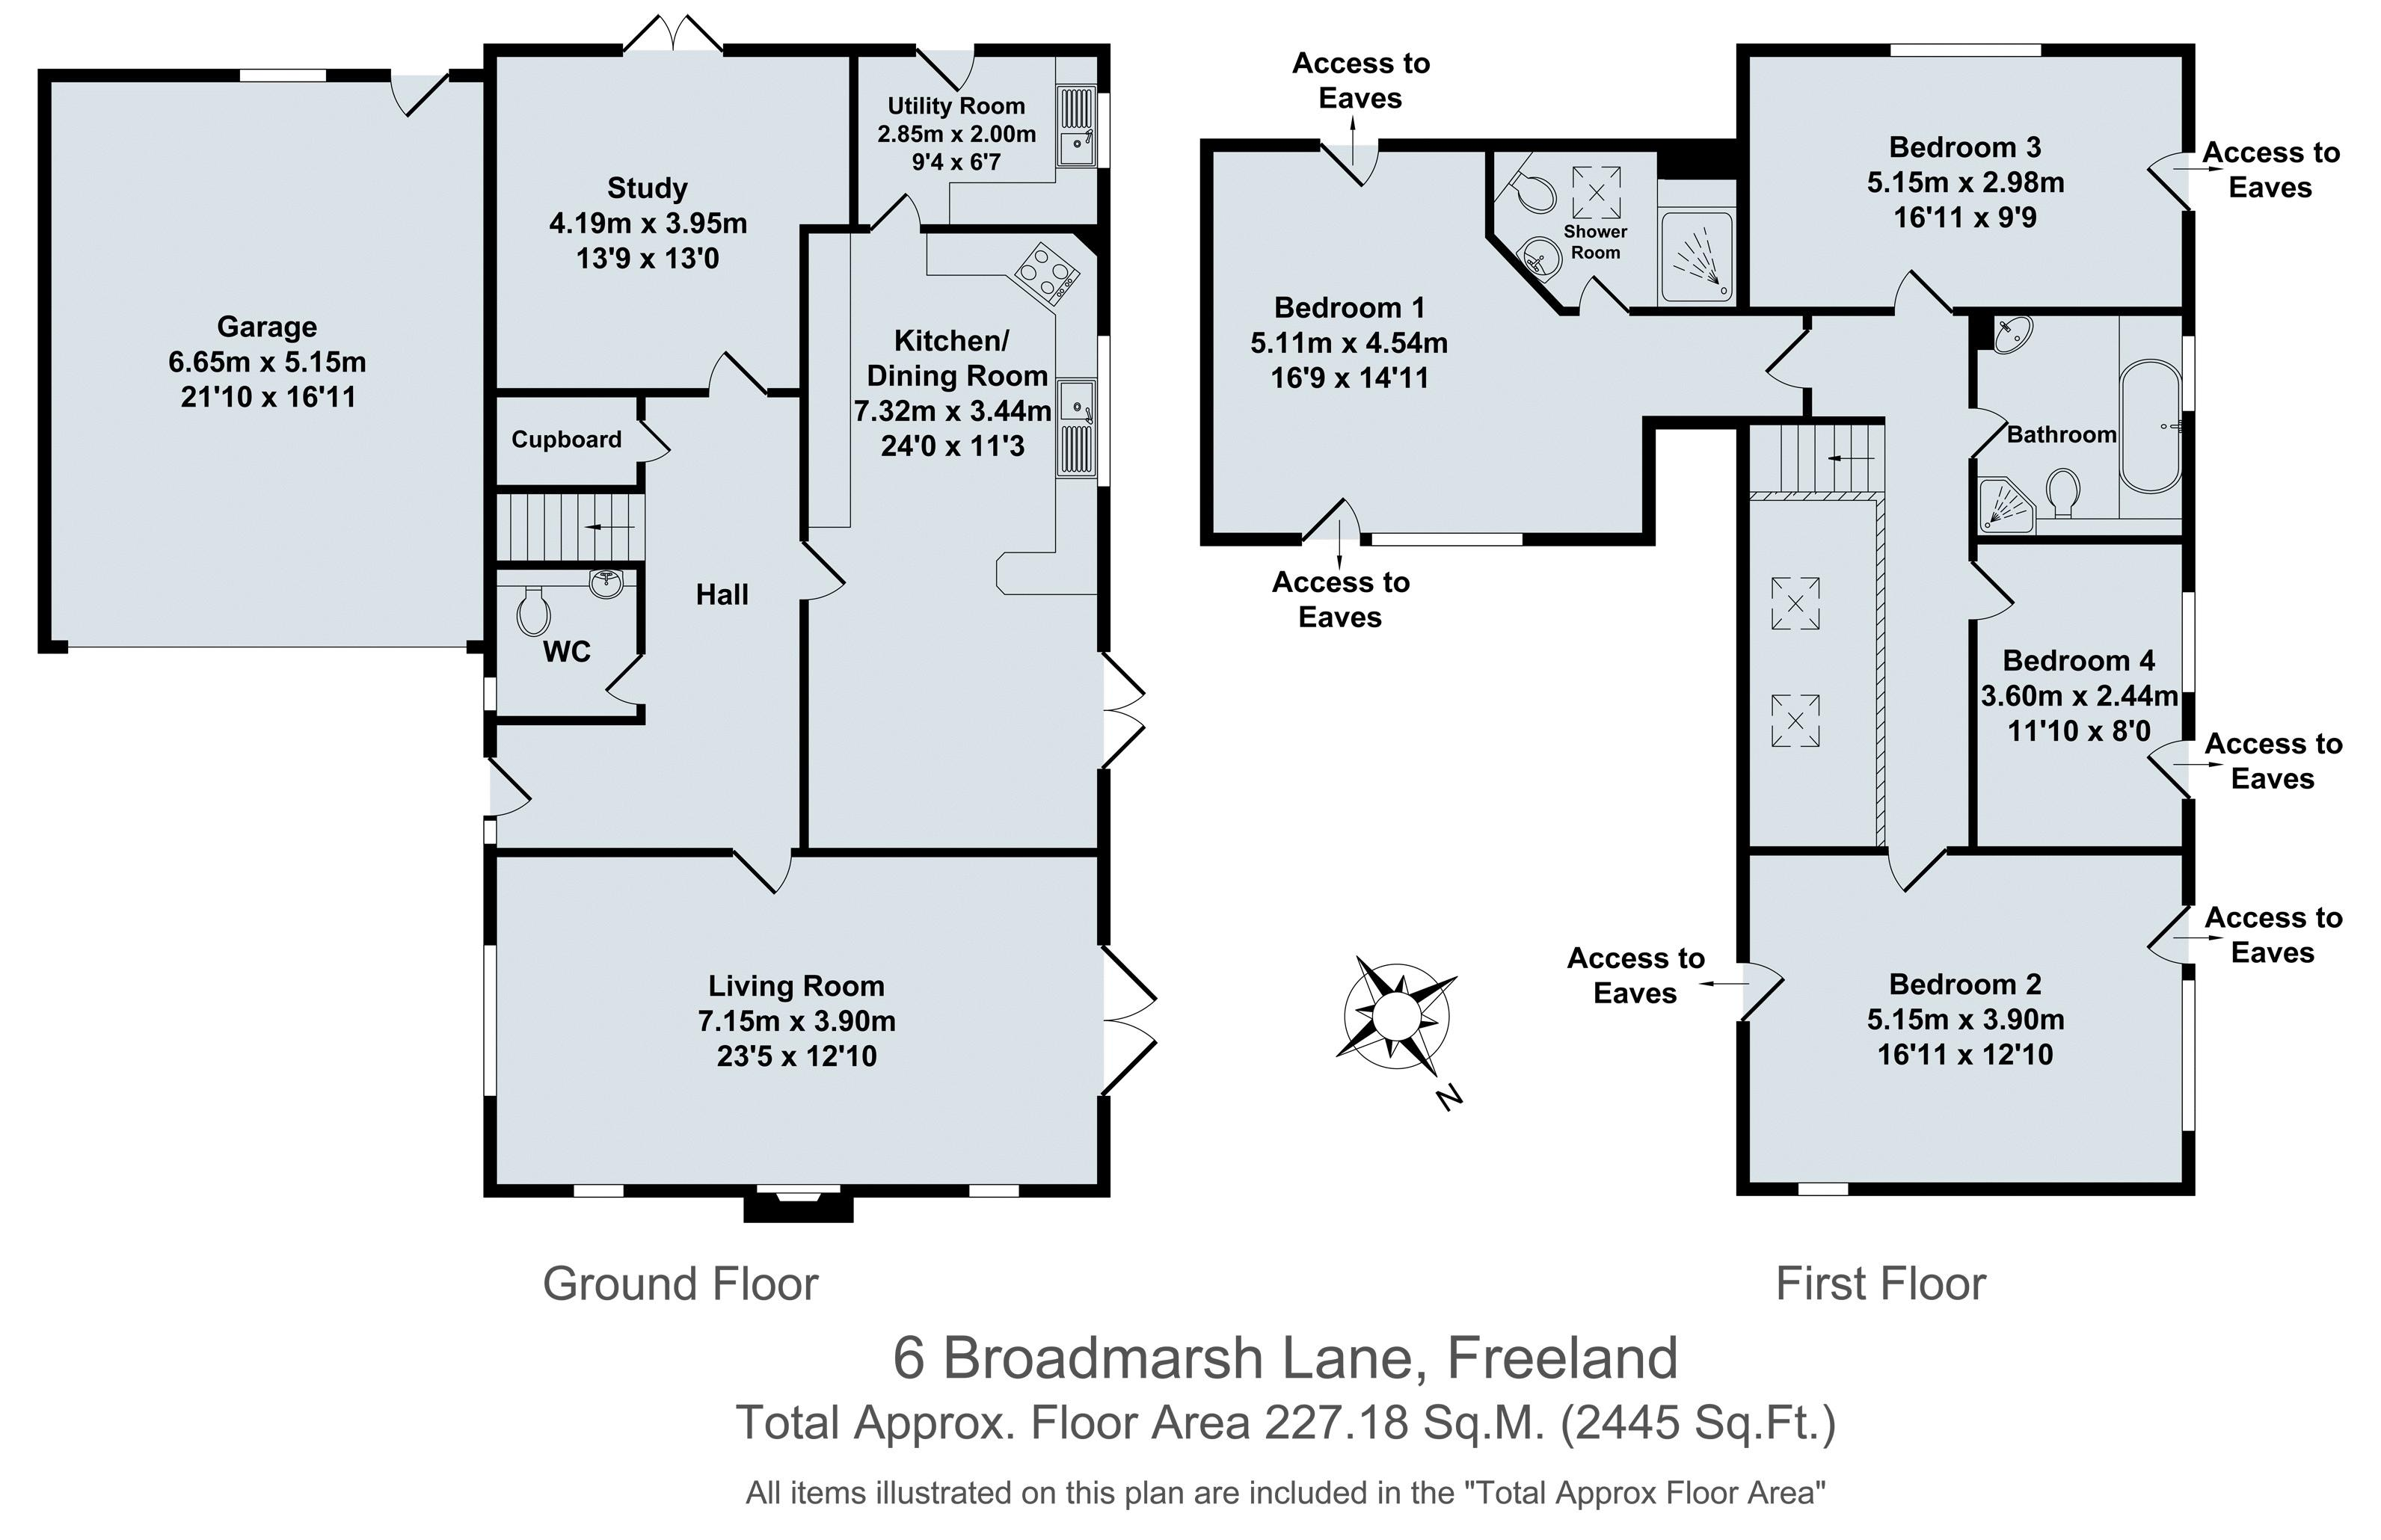 Broadmarsh Lane